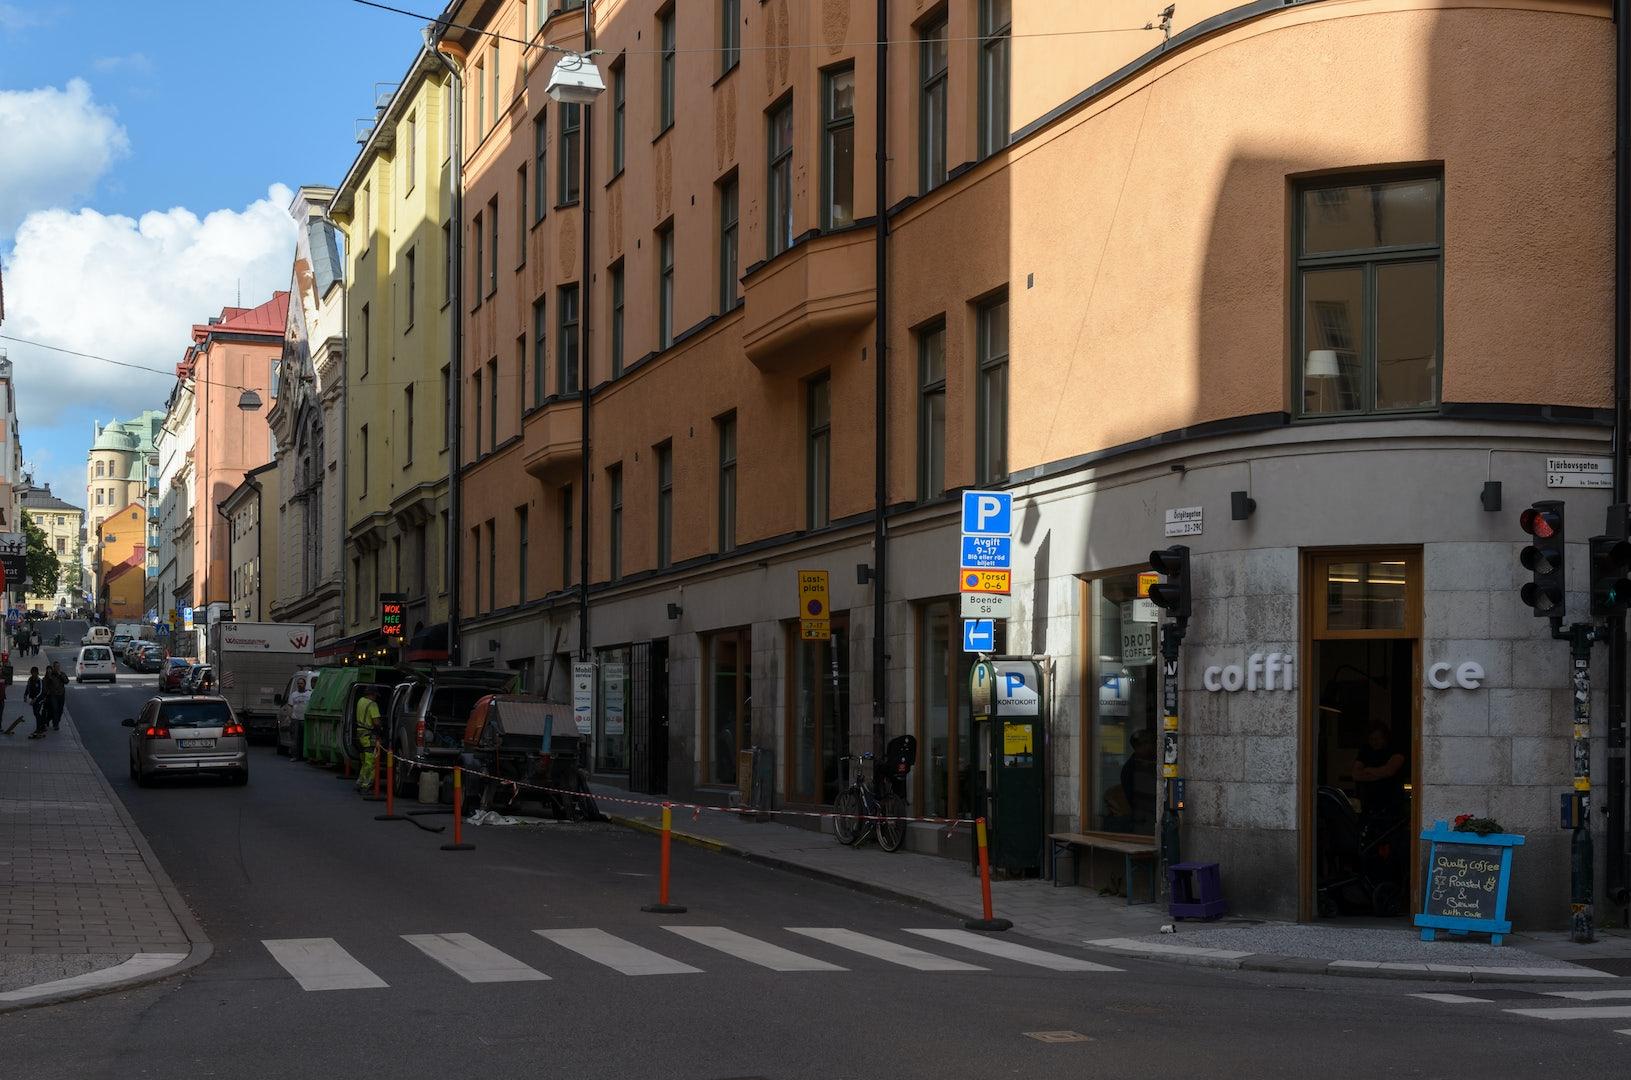 Stockholm - Coffice